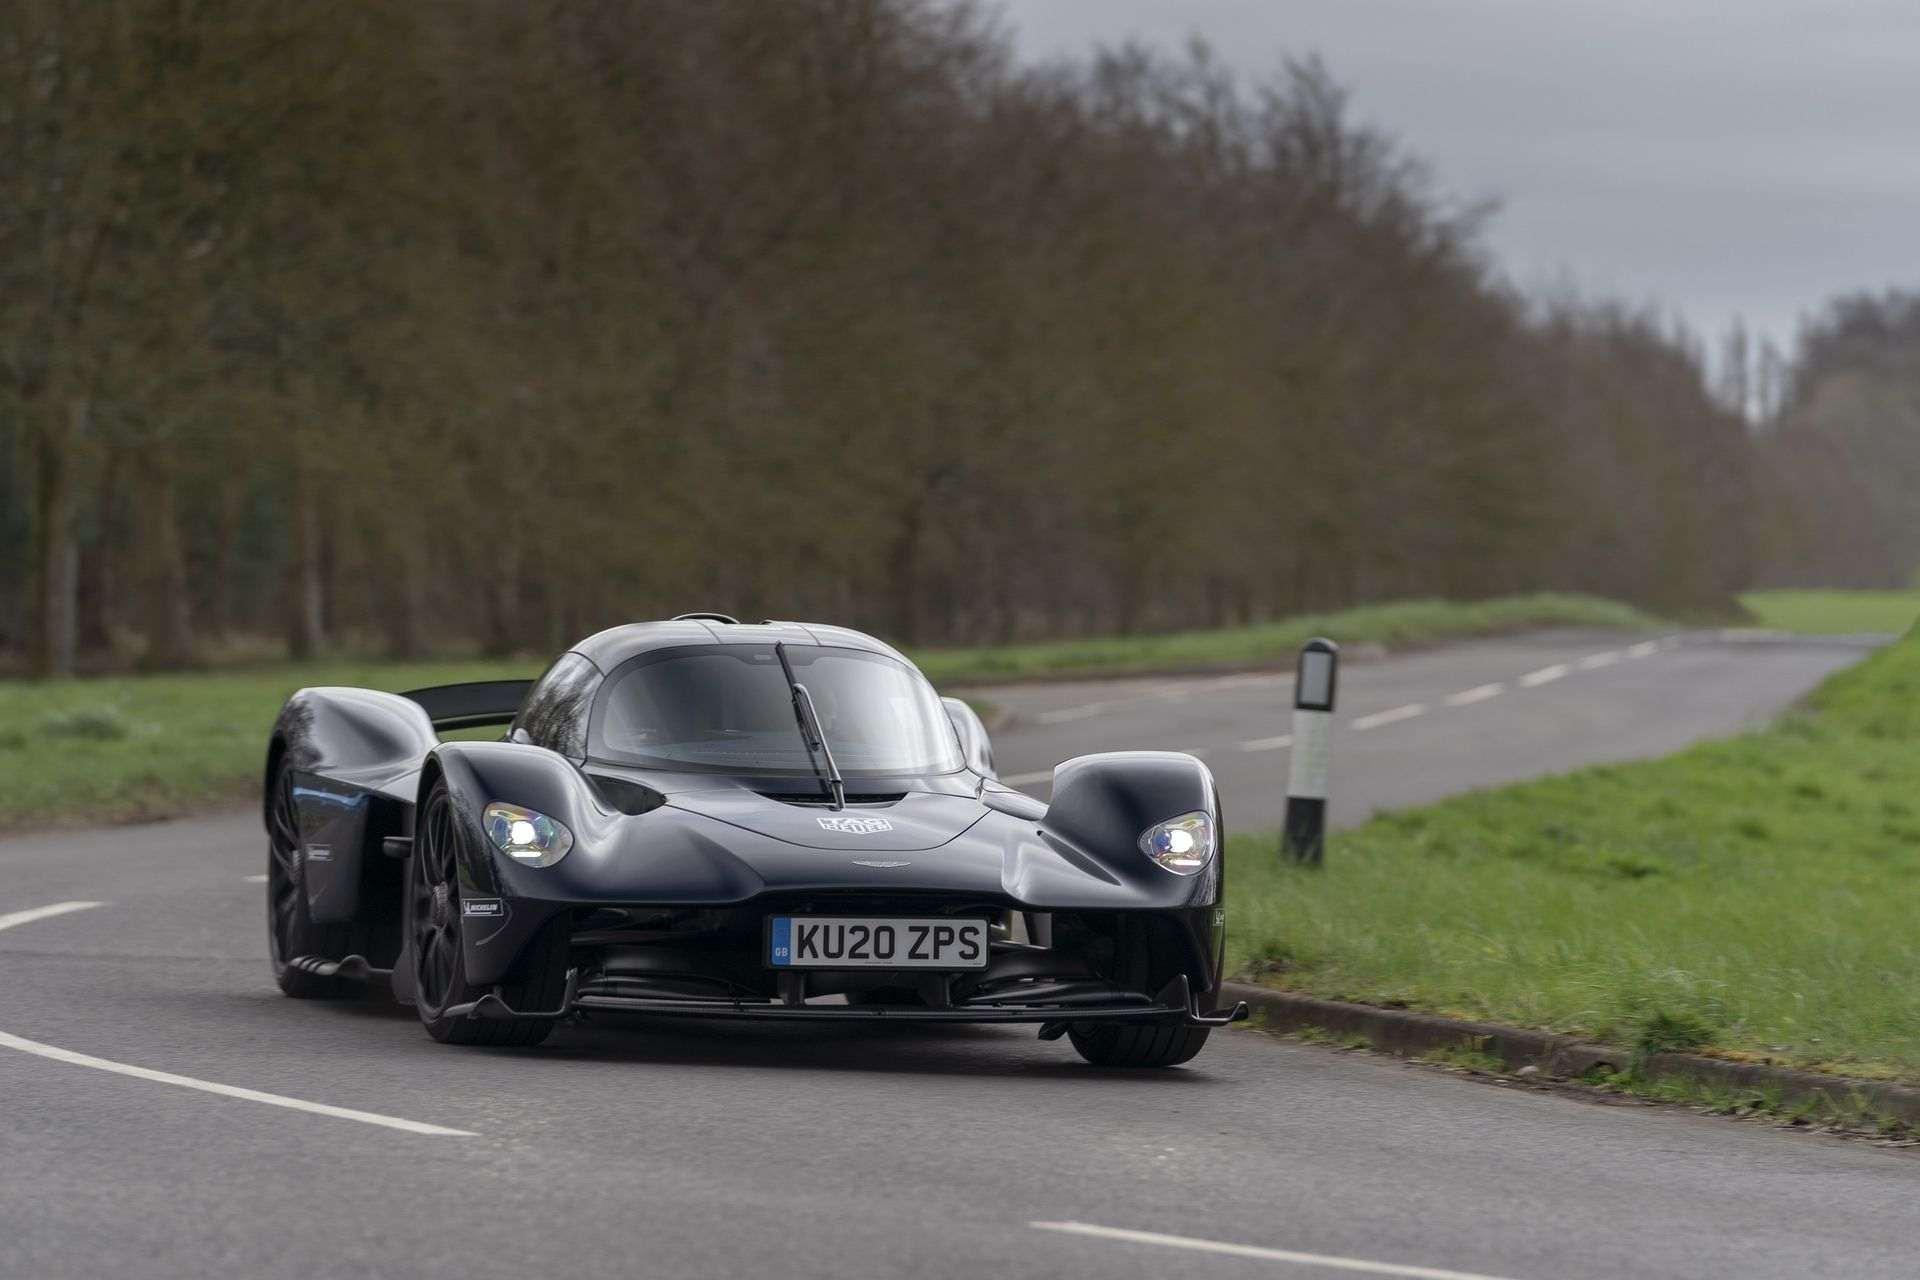 Aston_Martin_Valkyrie_public_roads_0003